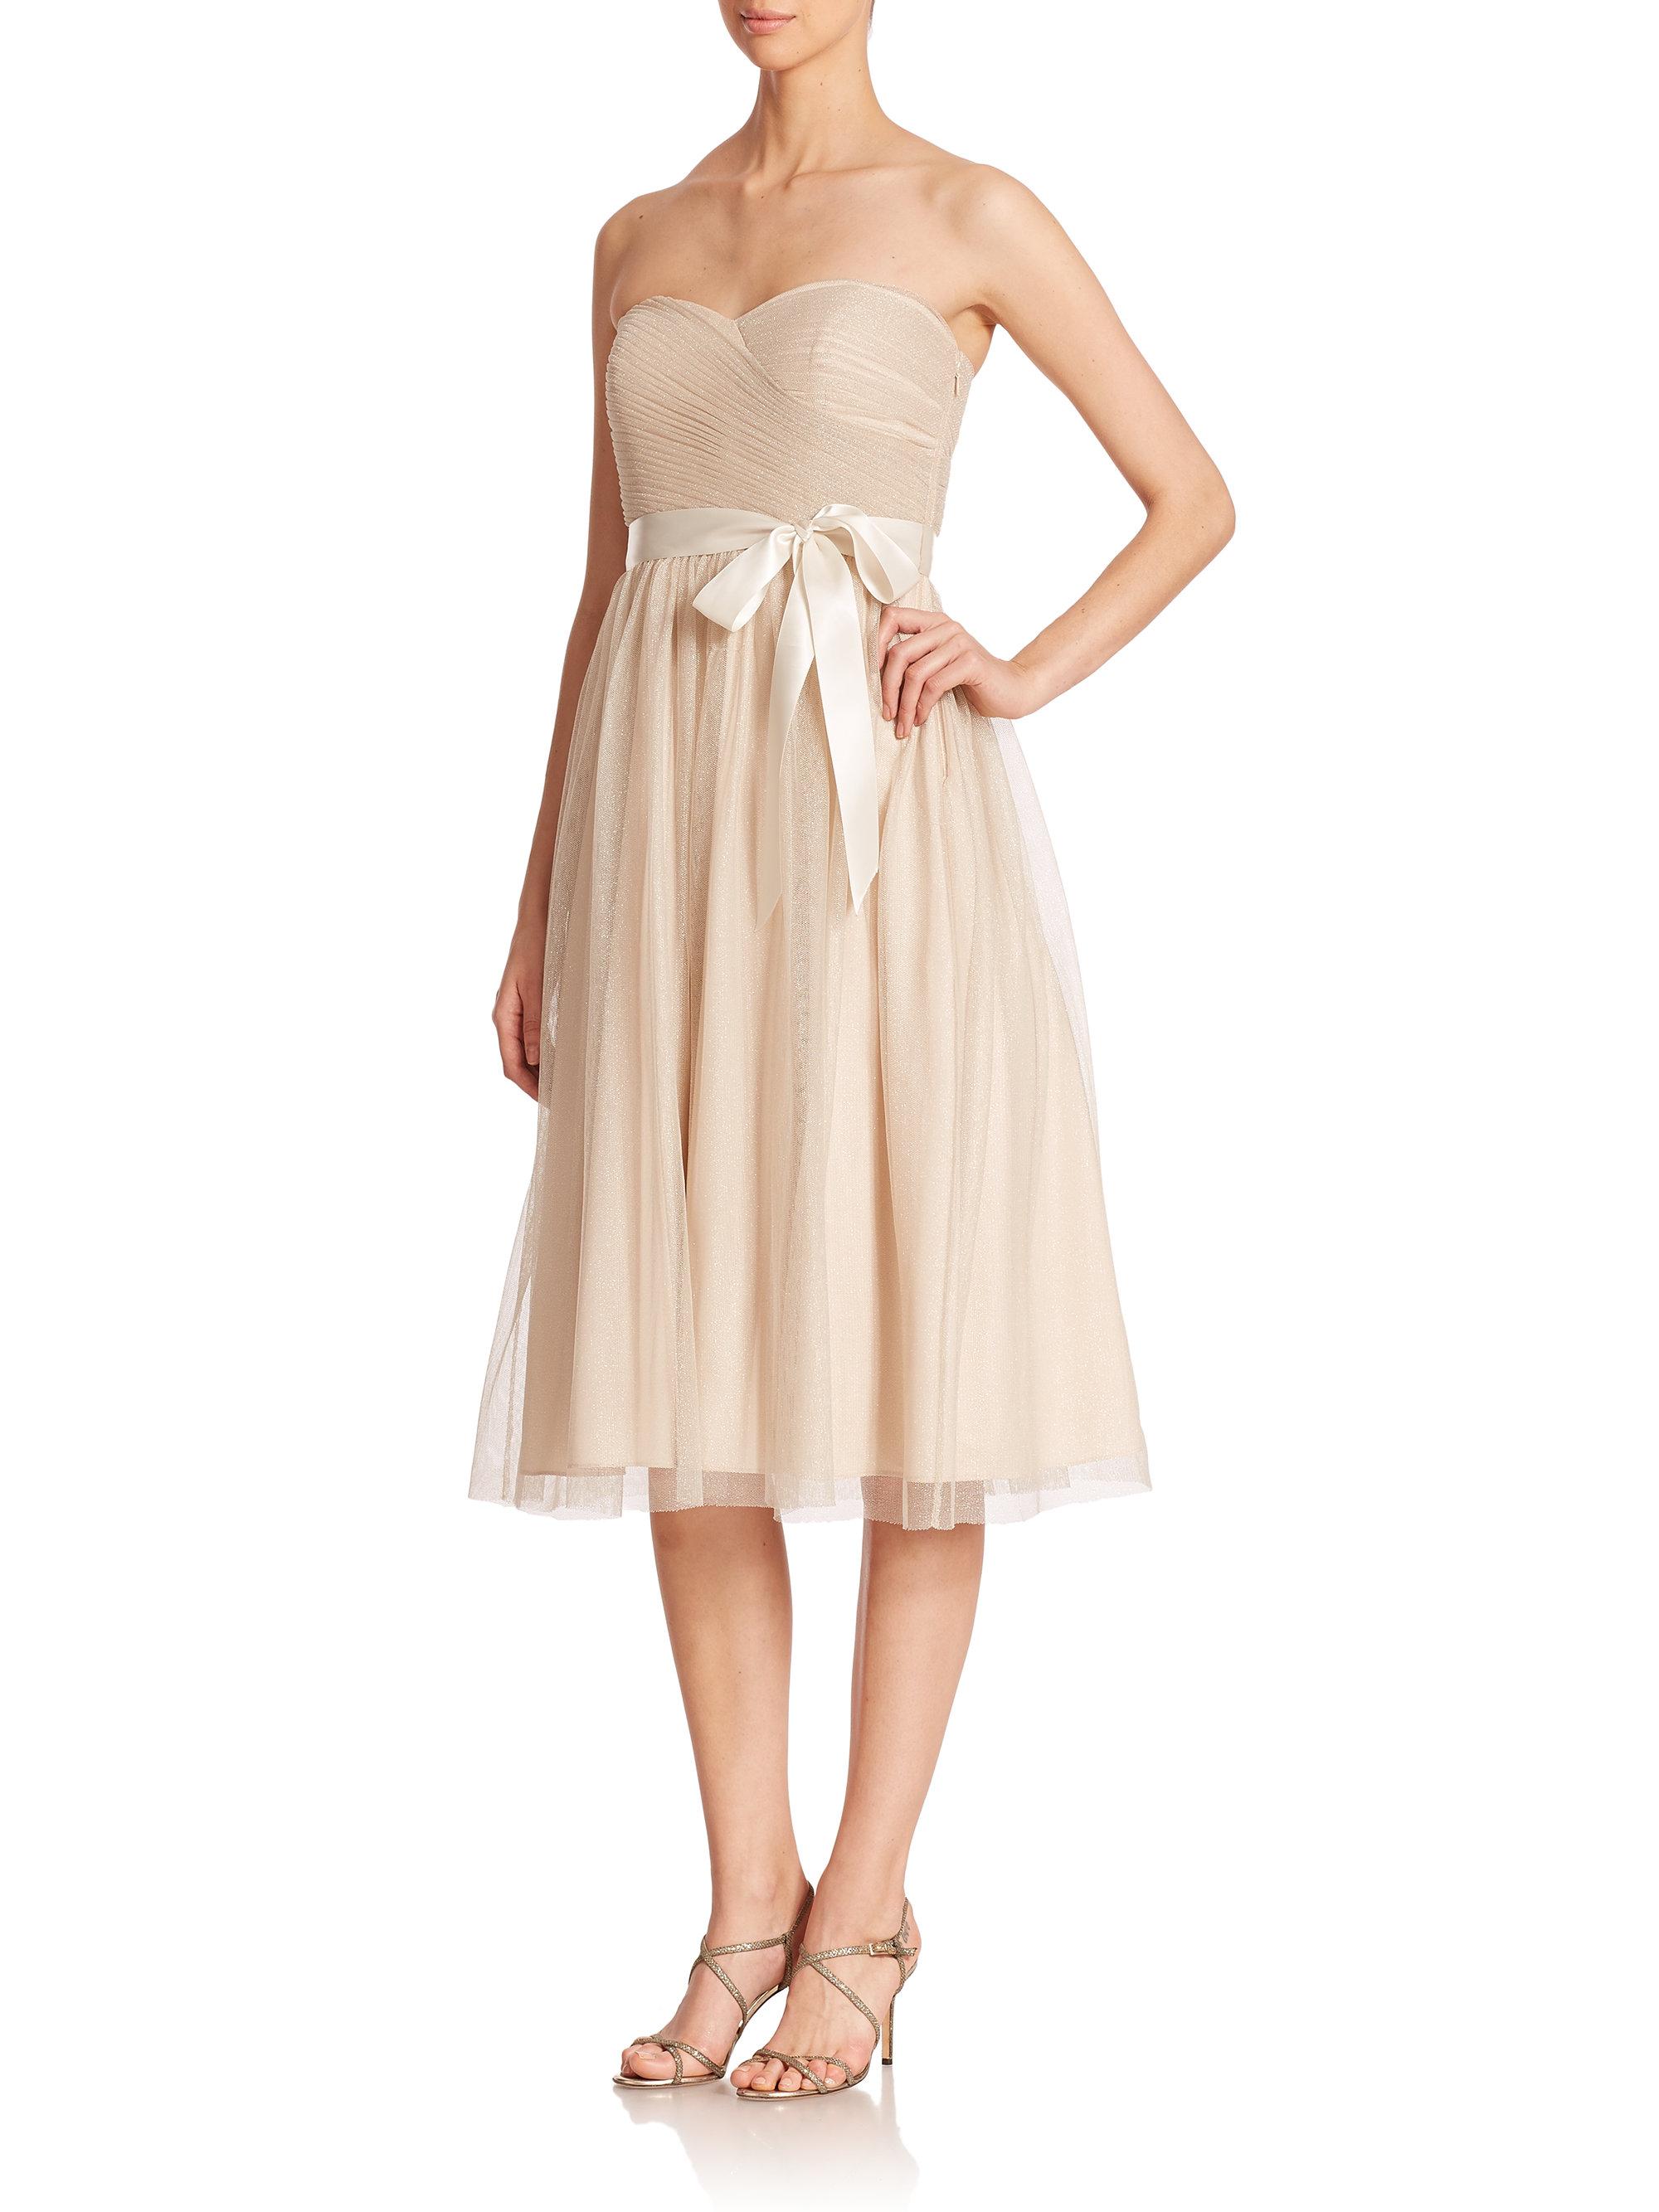 Aidan mattox strapless metallic mesh bridesmaid dress in metallic gallery ombrellifo Choice Image